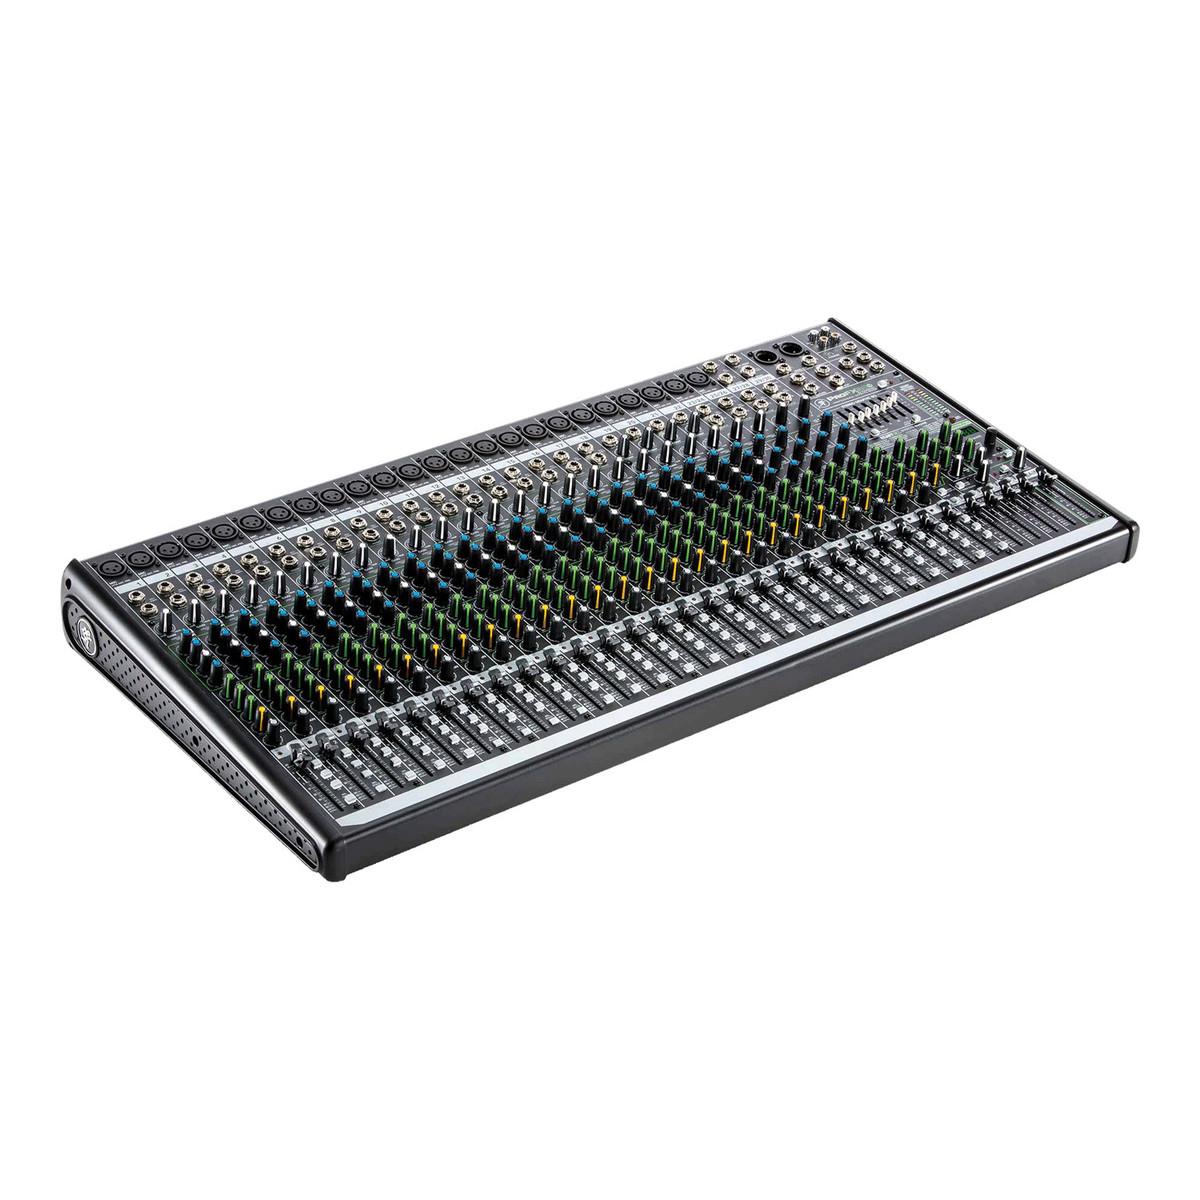 Table de mixage mackie profx30v2 effets professionnels de 30 canaux - Table de mixage professionnel ...